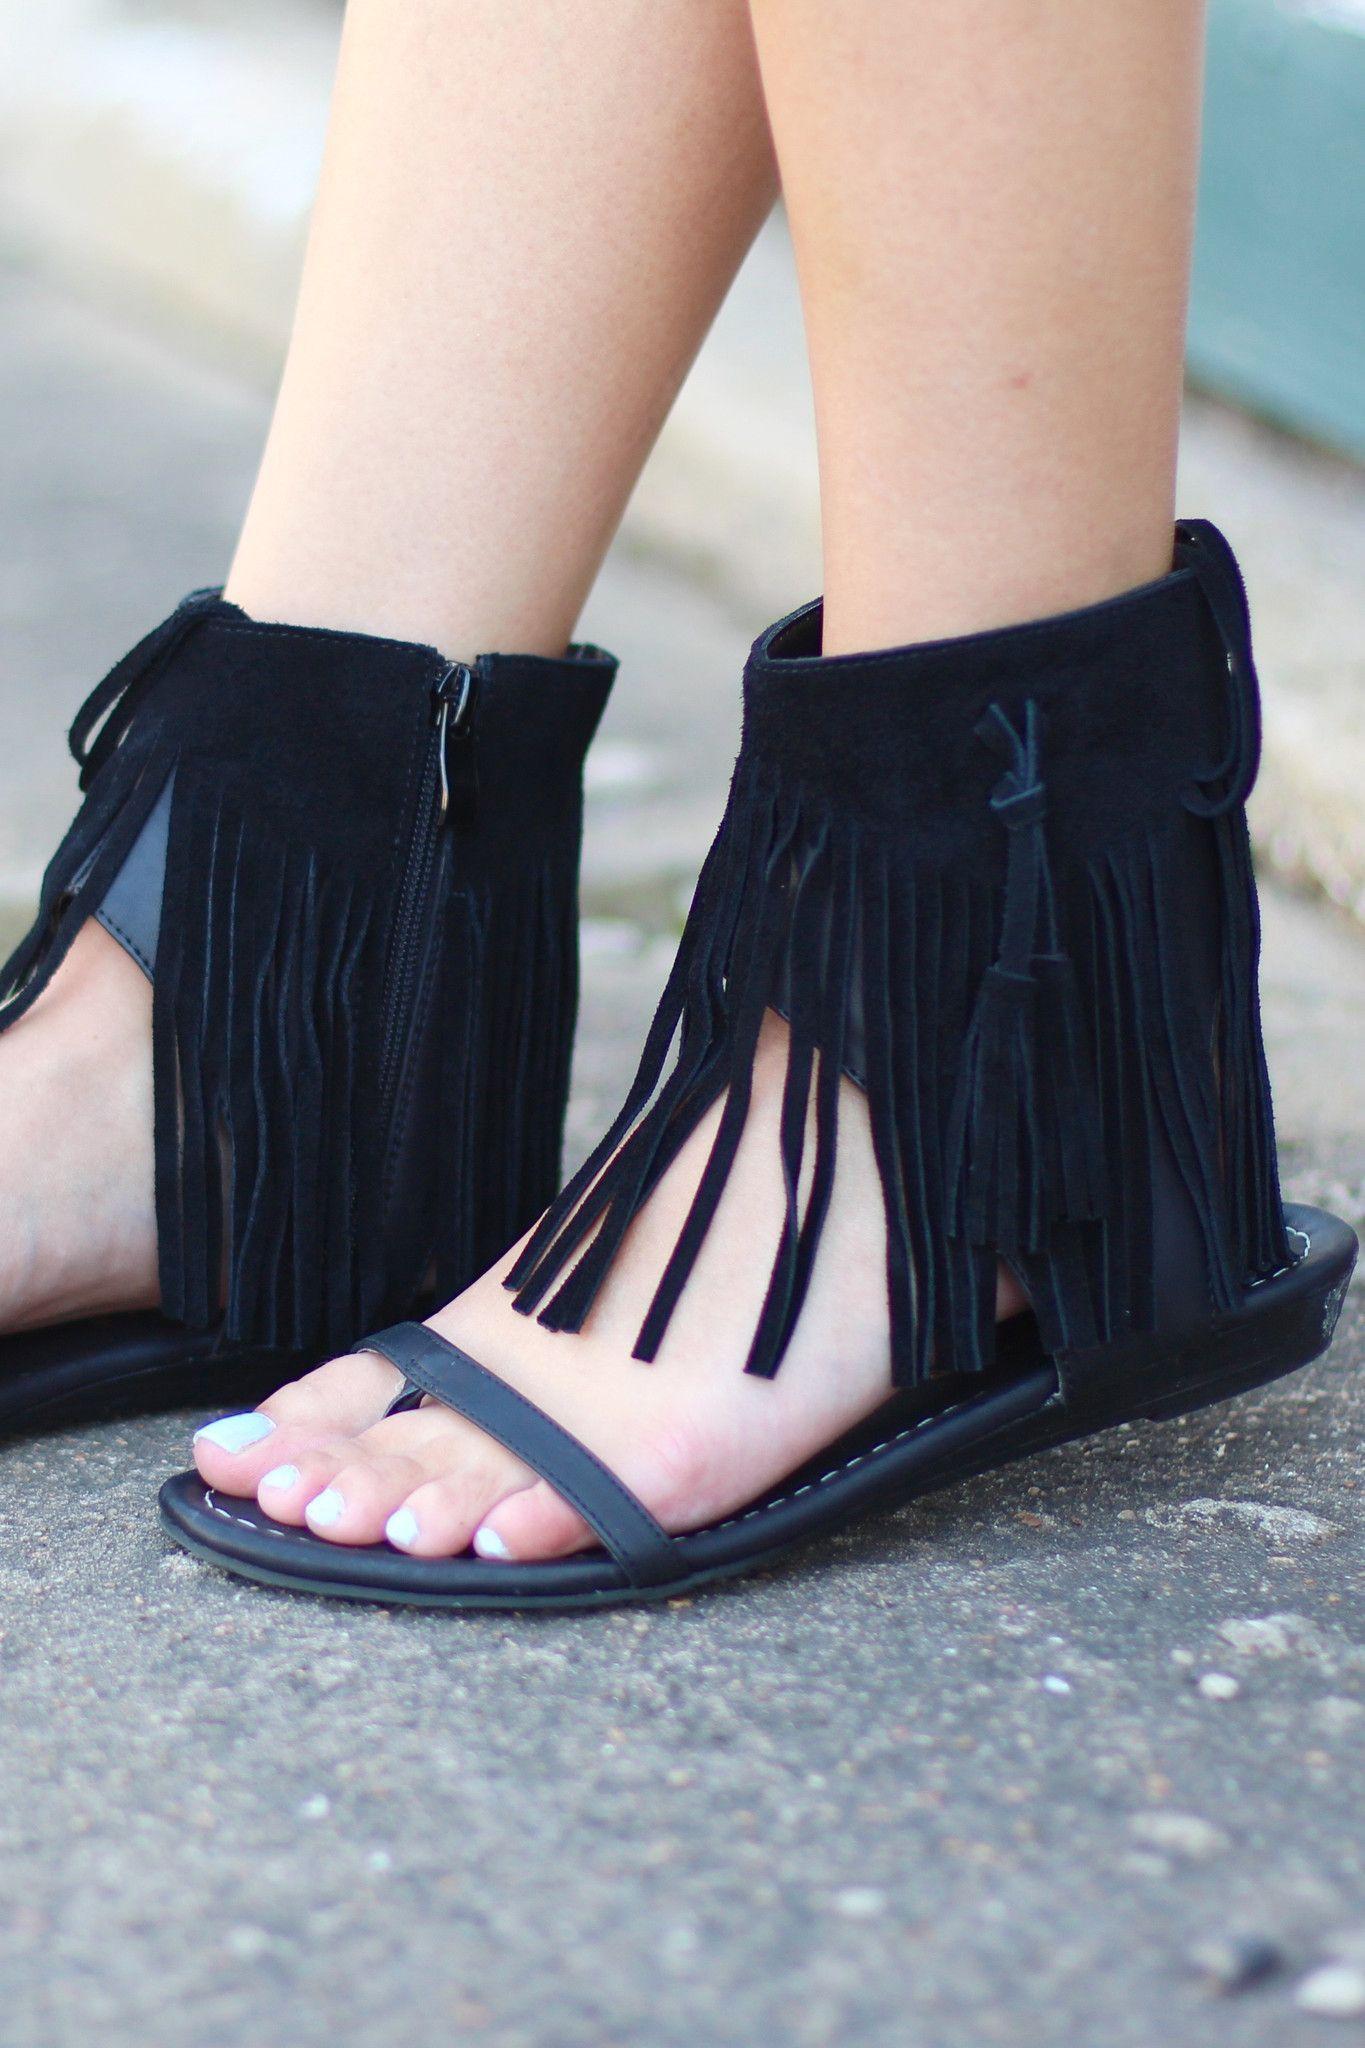 ccf59c52c2423b Lex Fringe Sandal by VERY VOLATILE  Black